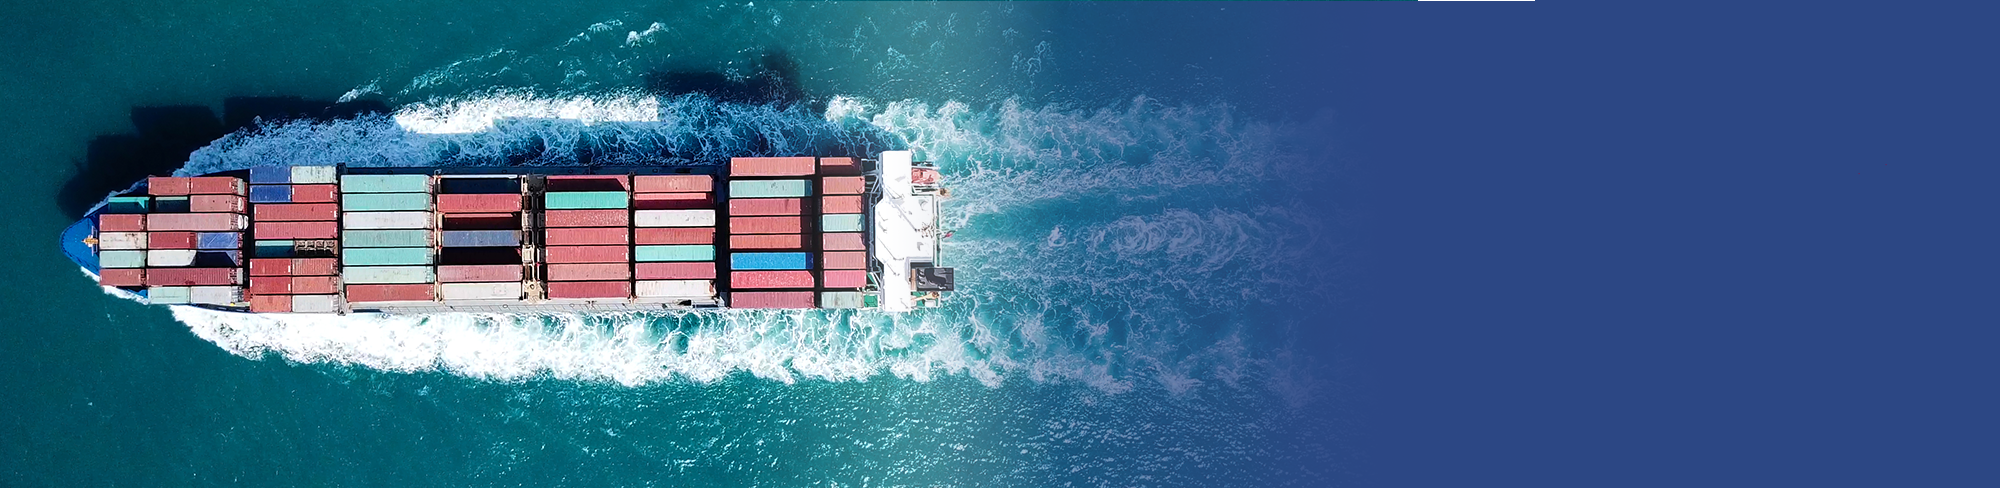 Martinme Shipping Header Image.png